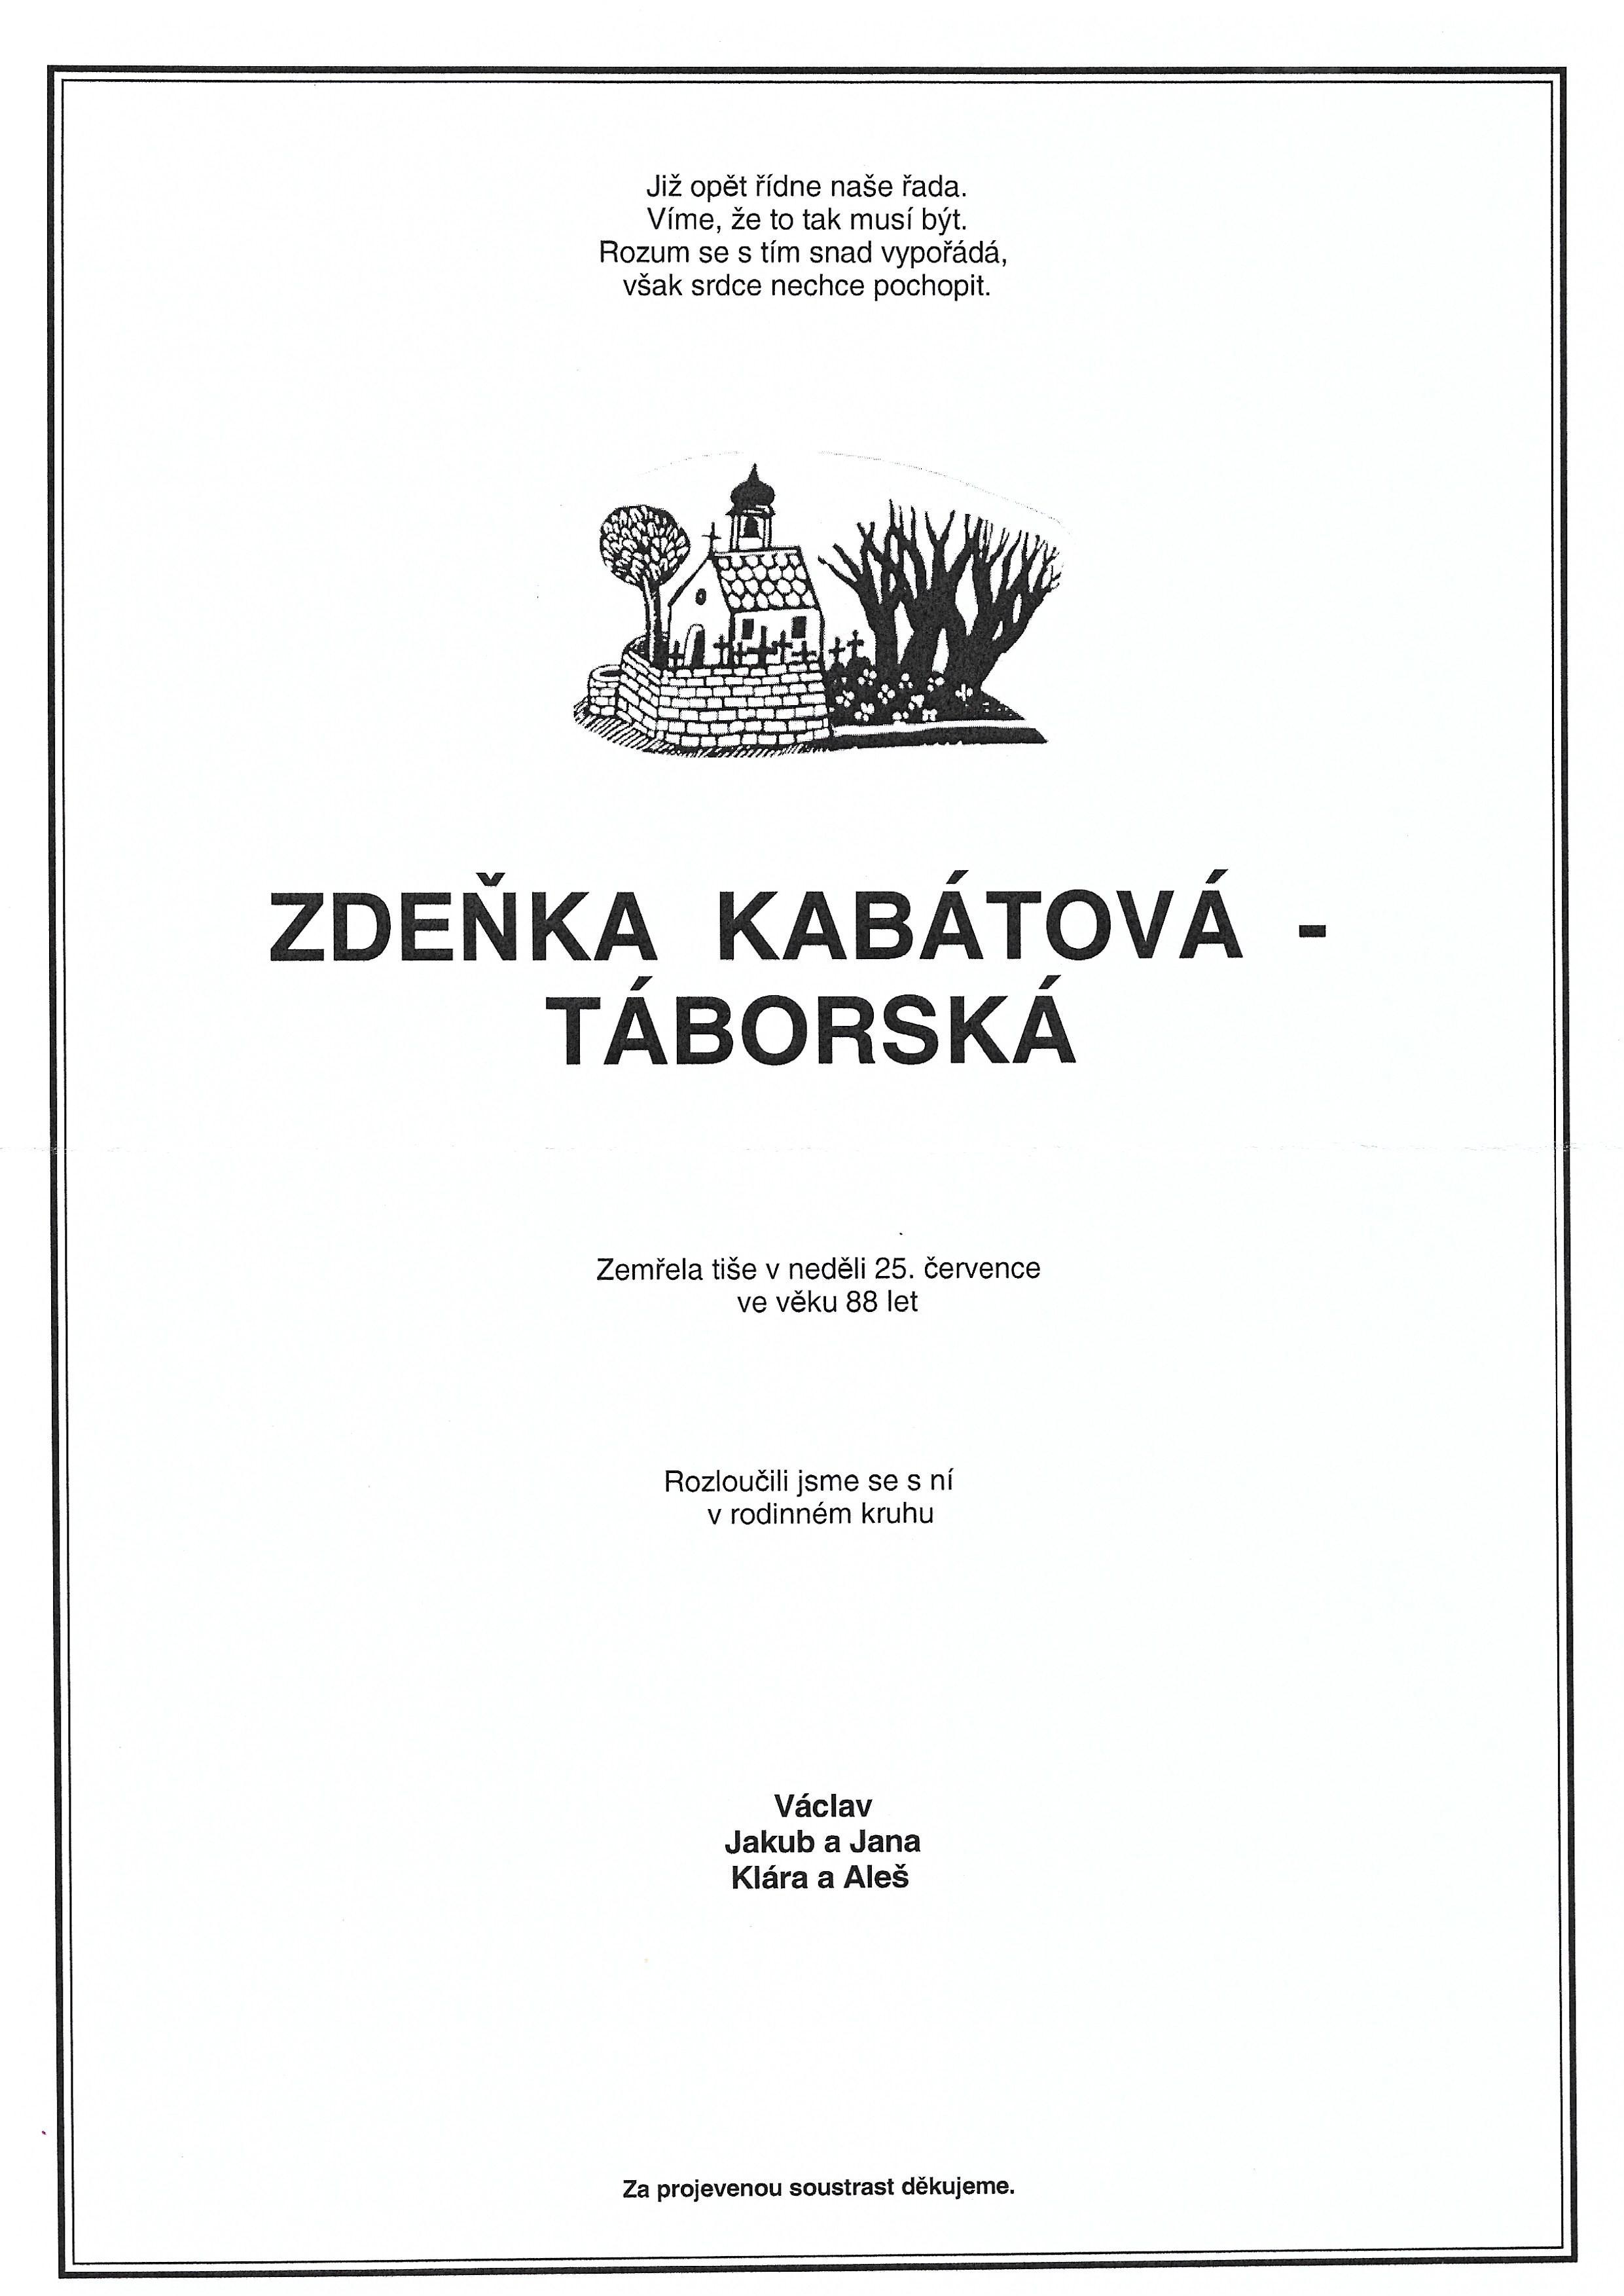 Zdena Kabátová Táborská parte